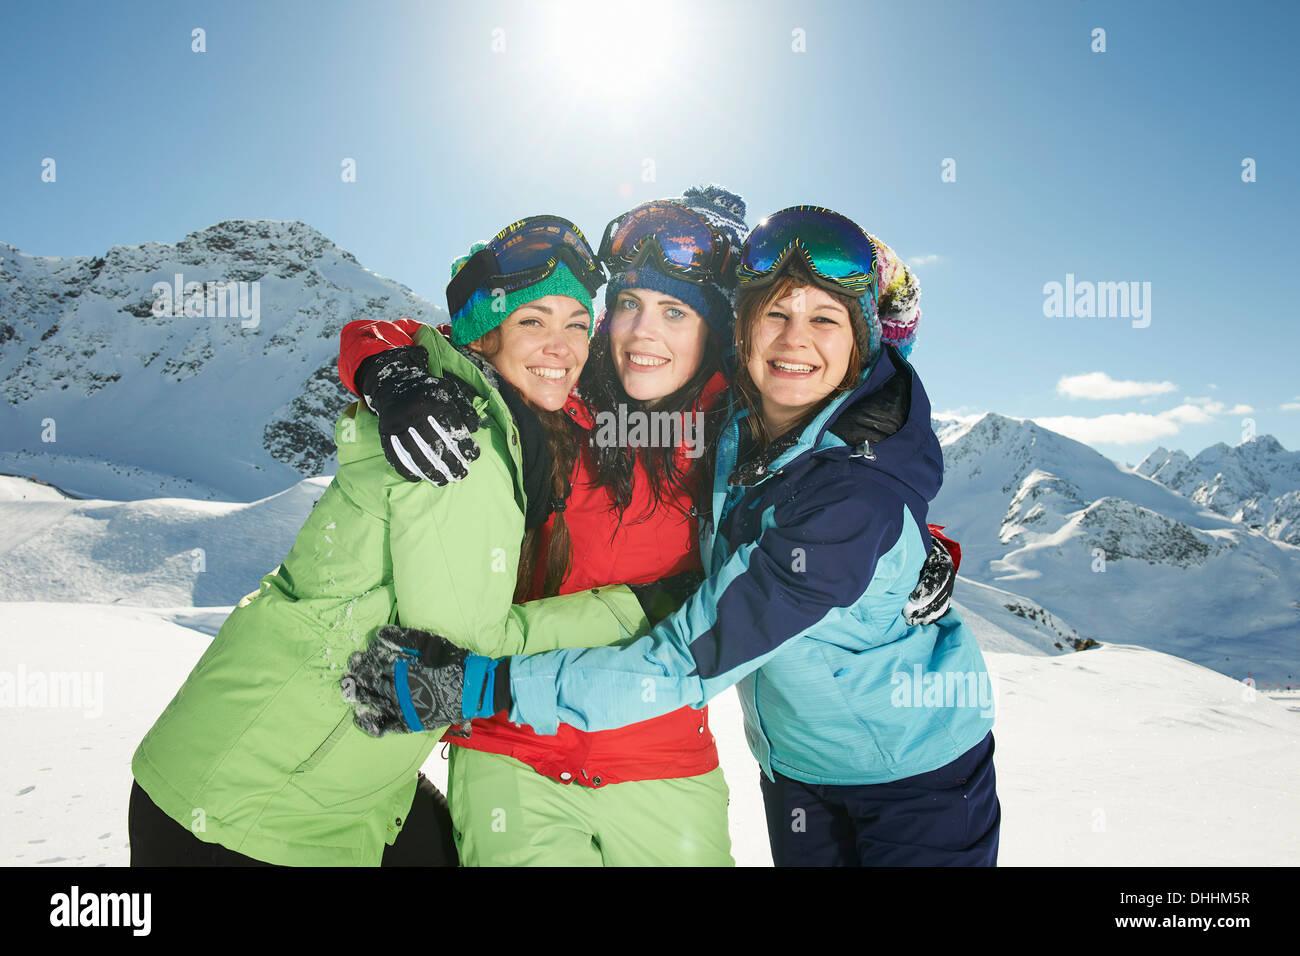 Female friends wearing skiwear, Kuhtai, Austria - Stock Image